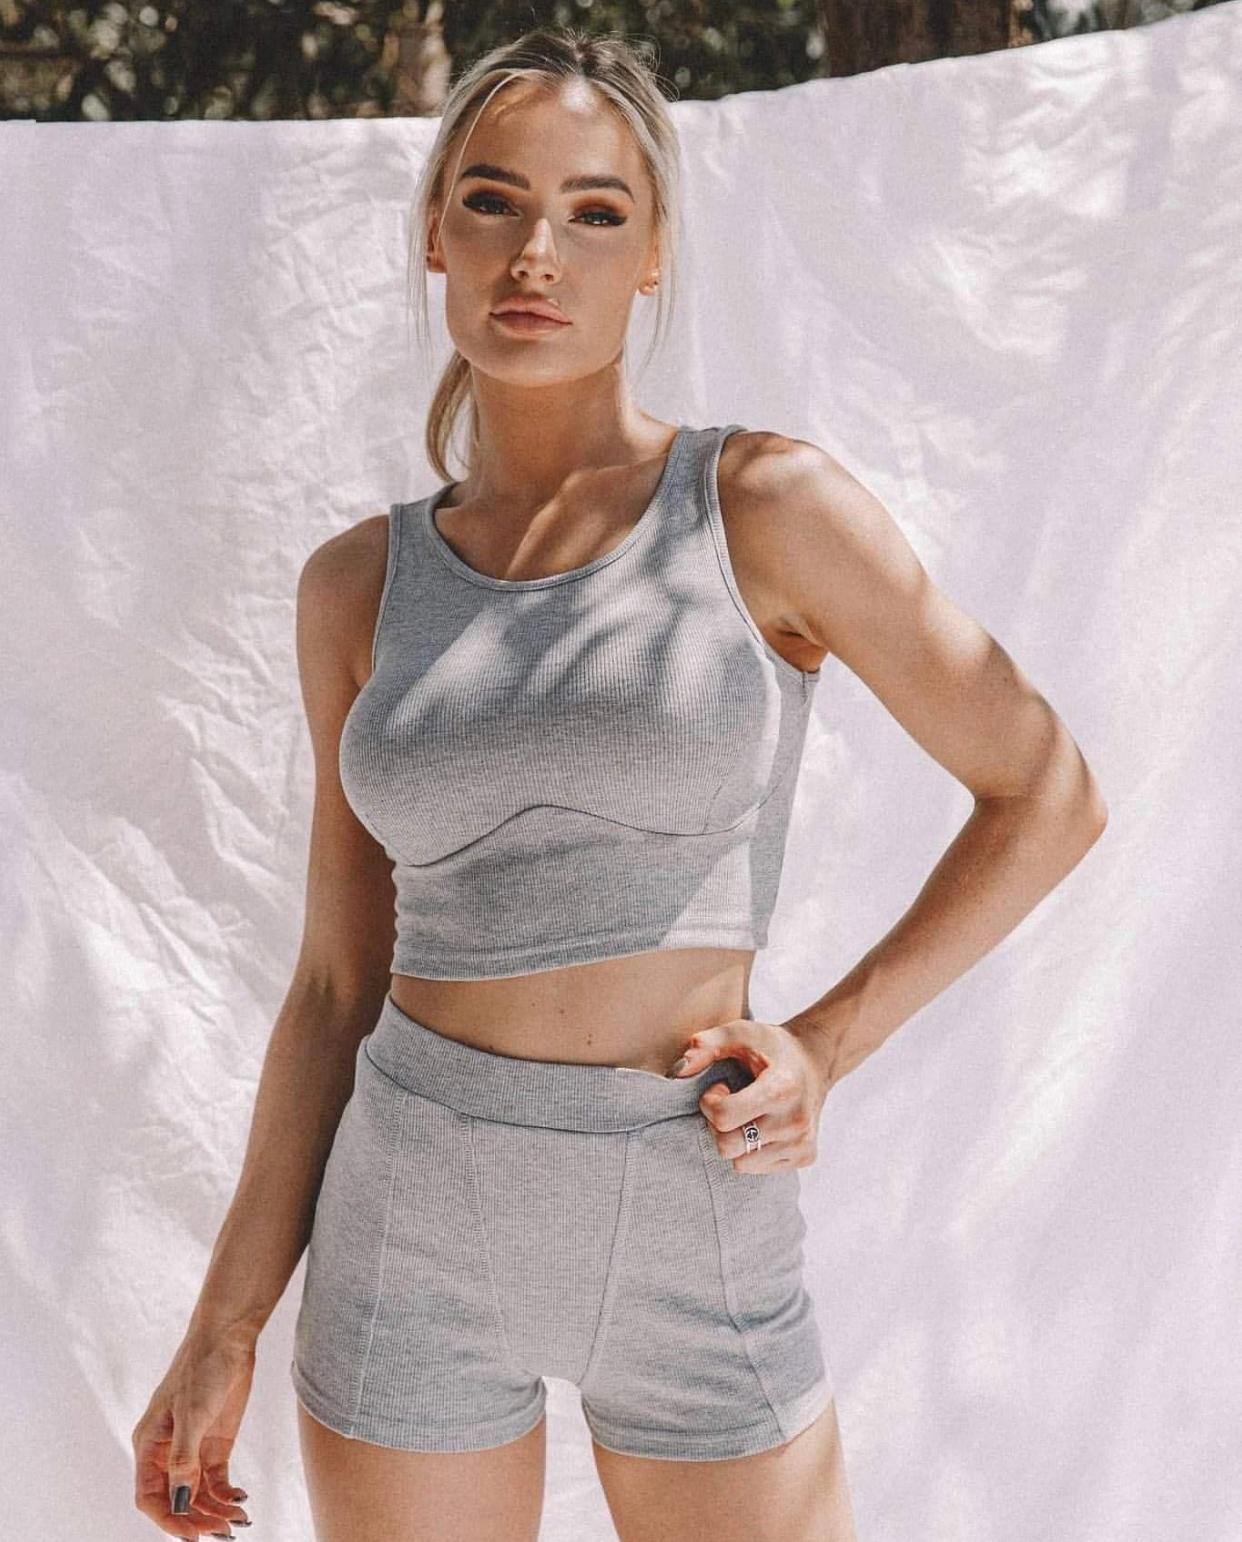 Alex Queensland fitness model wearing nike